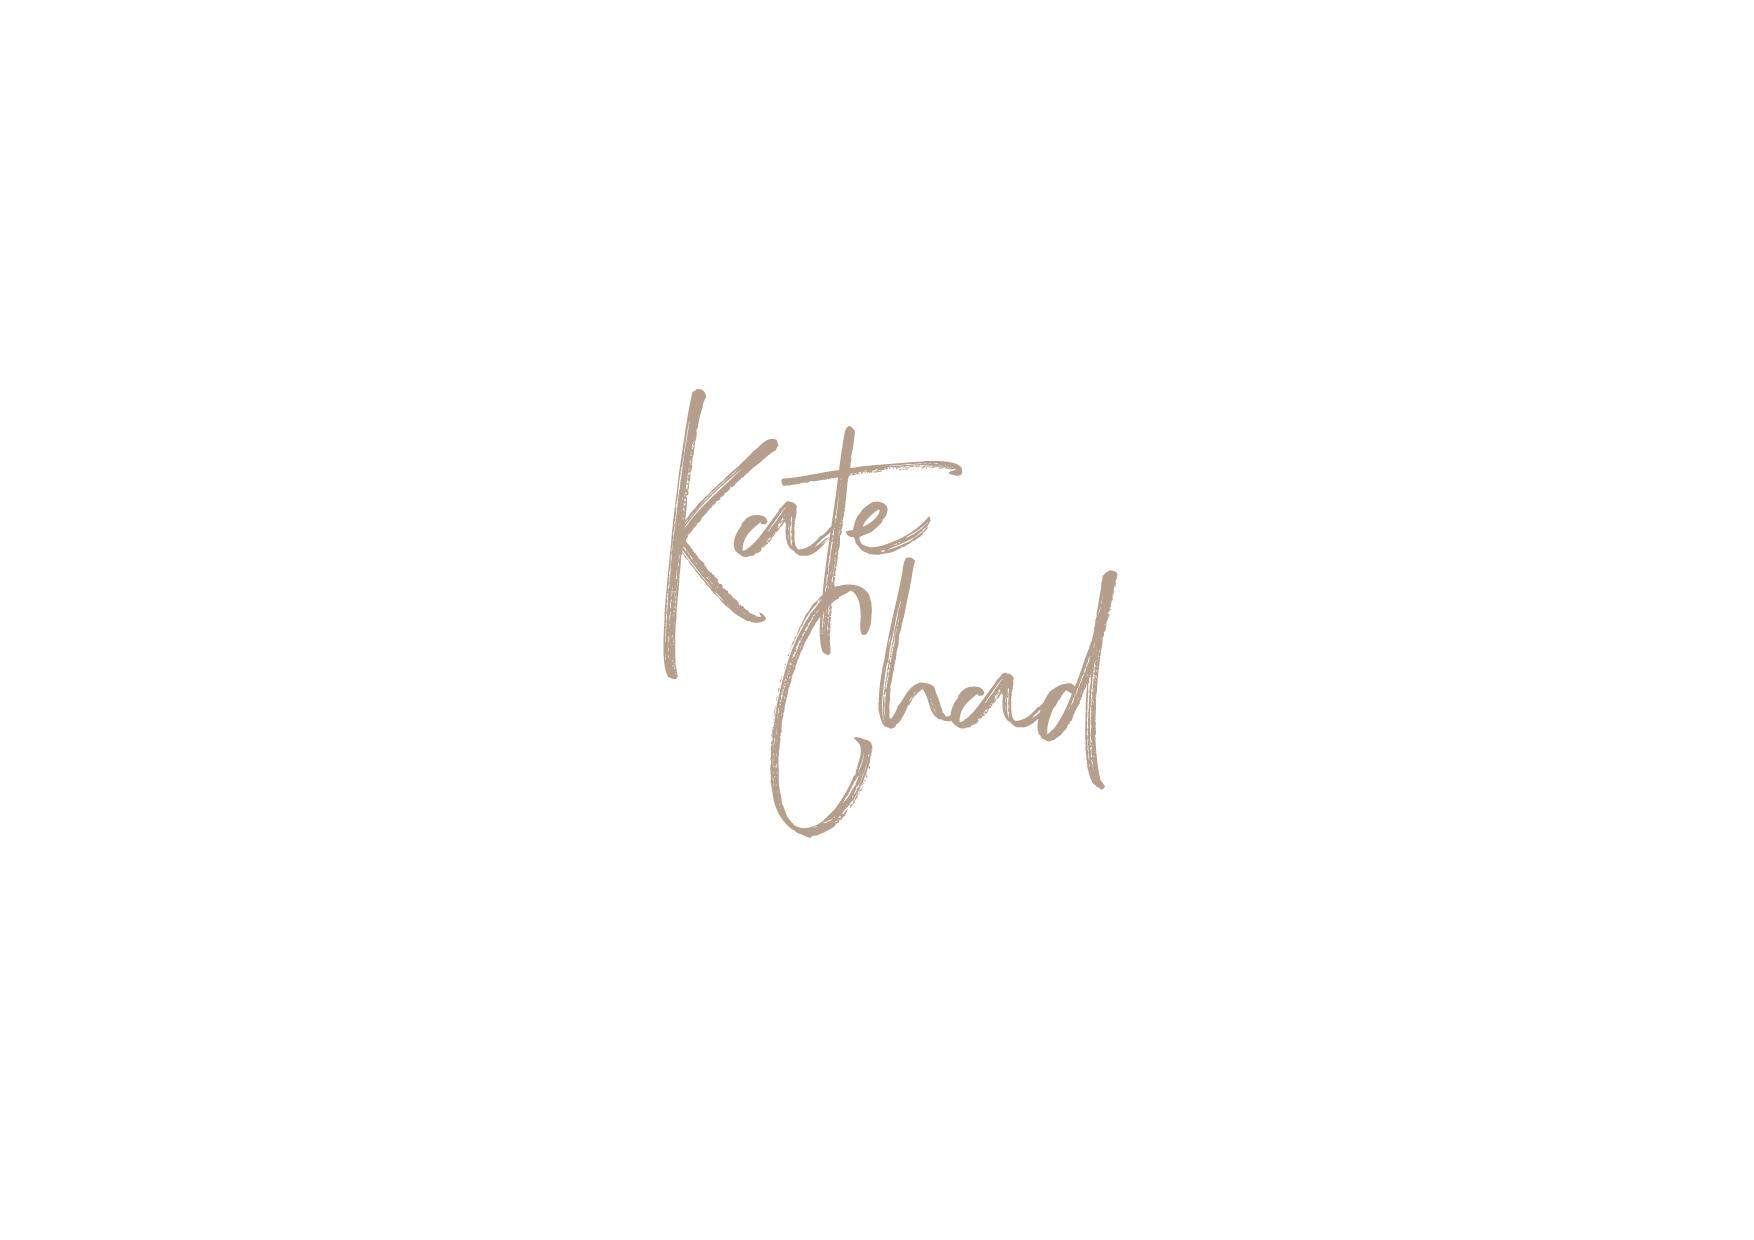 Kate Chad Logo Concept 1_6.jpg